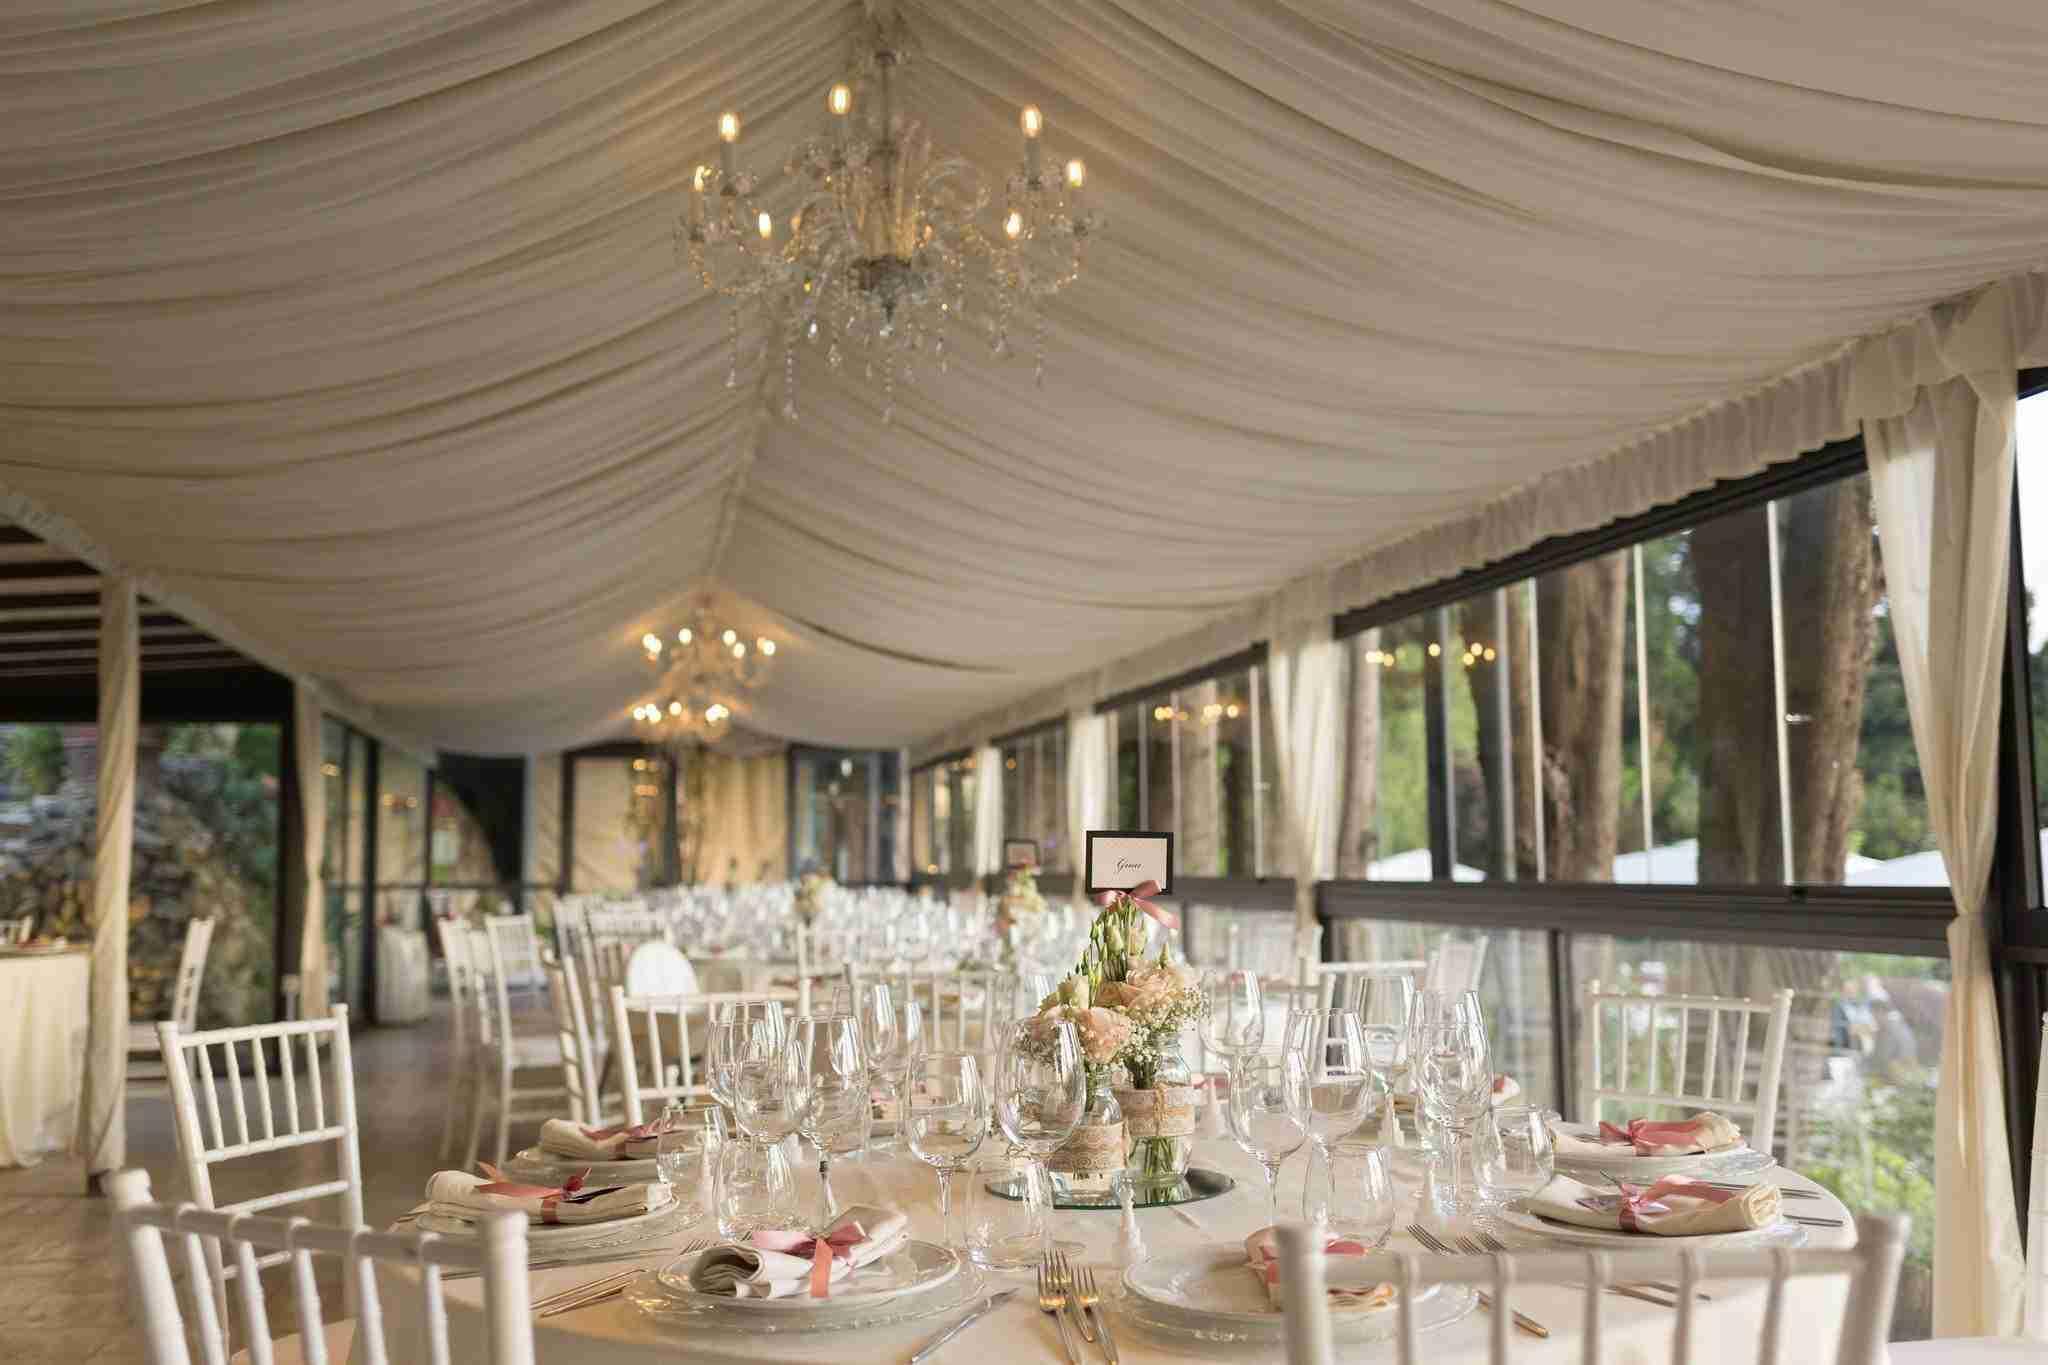 Matrimonio al Casale Baldetti: Sala Ricevimento